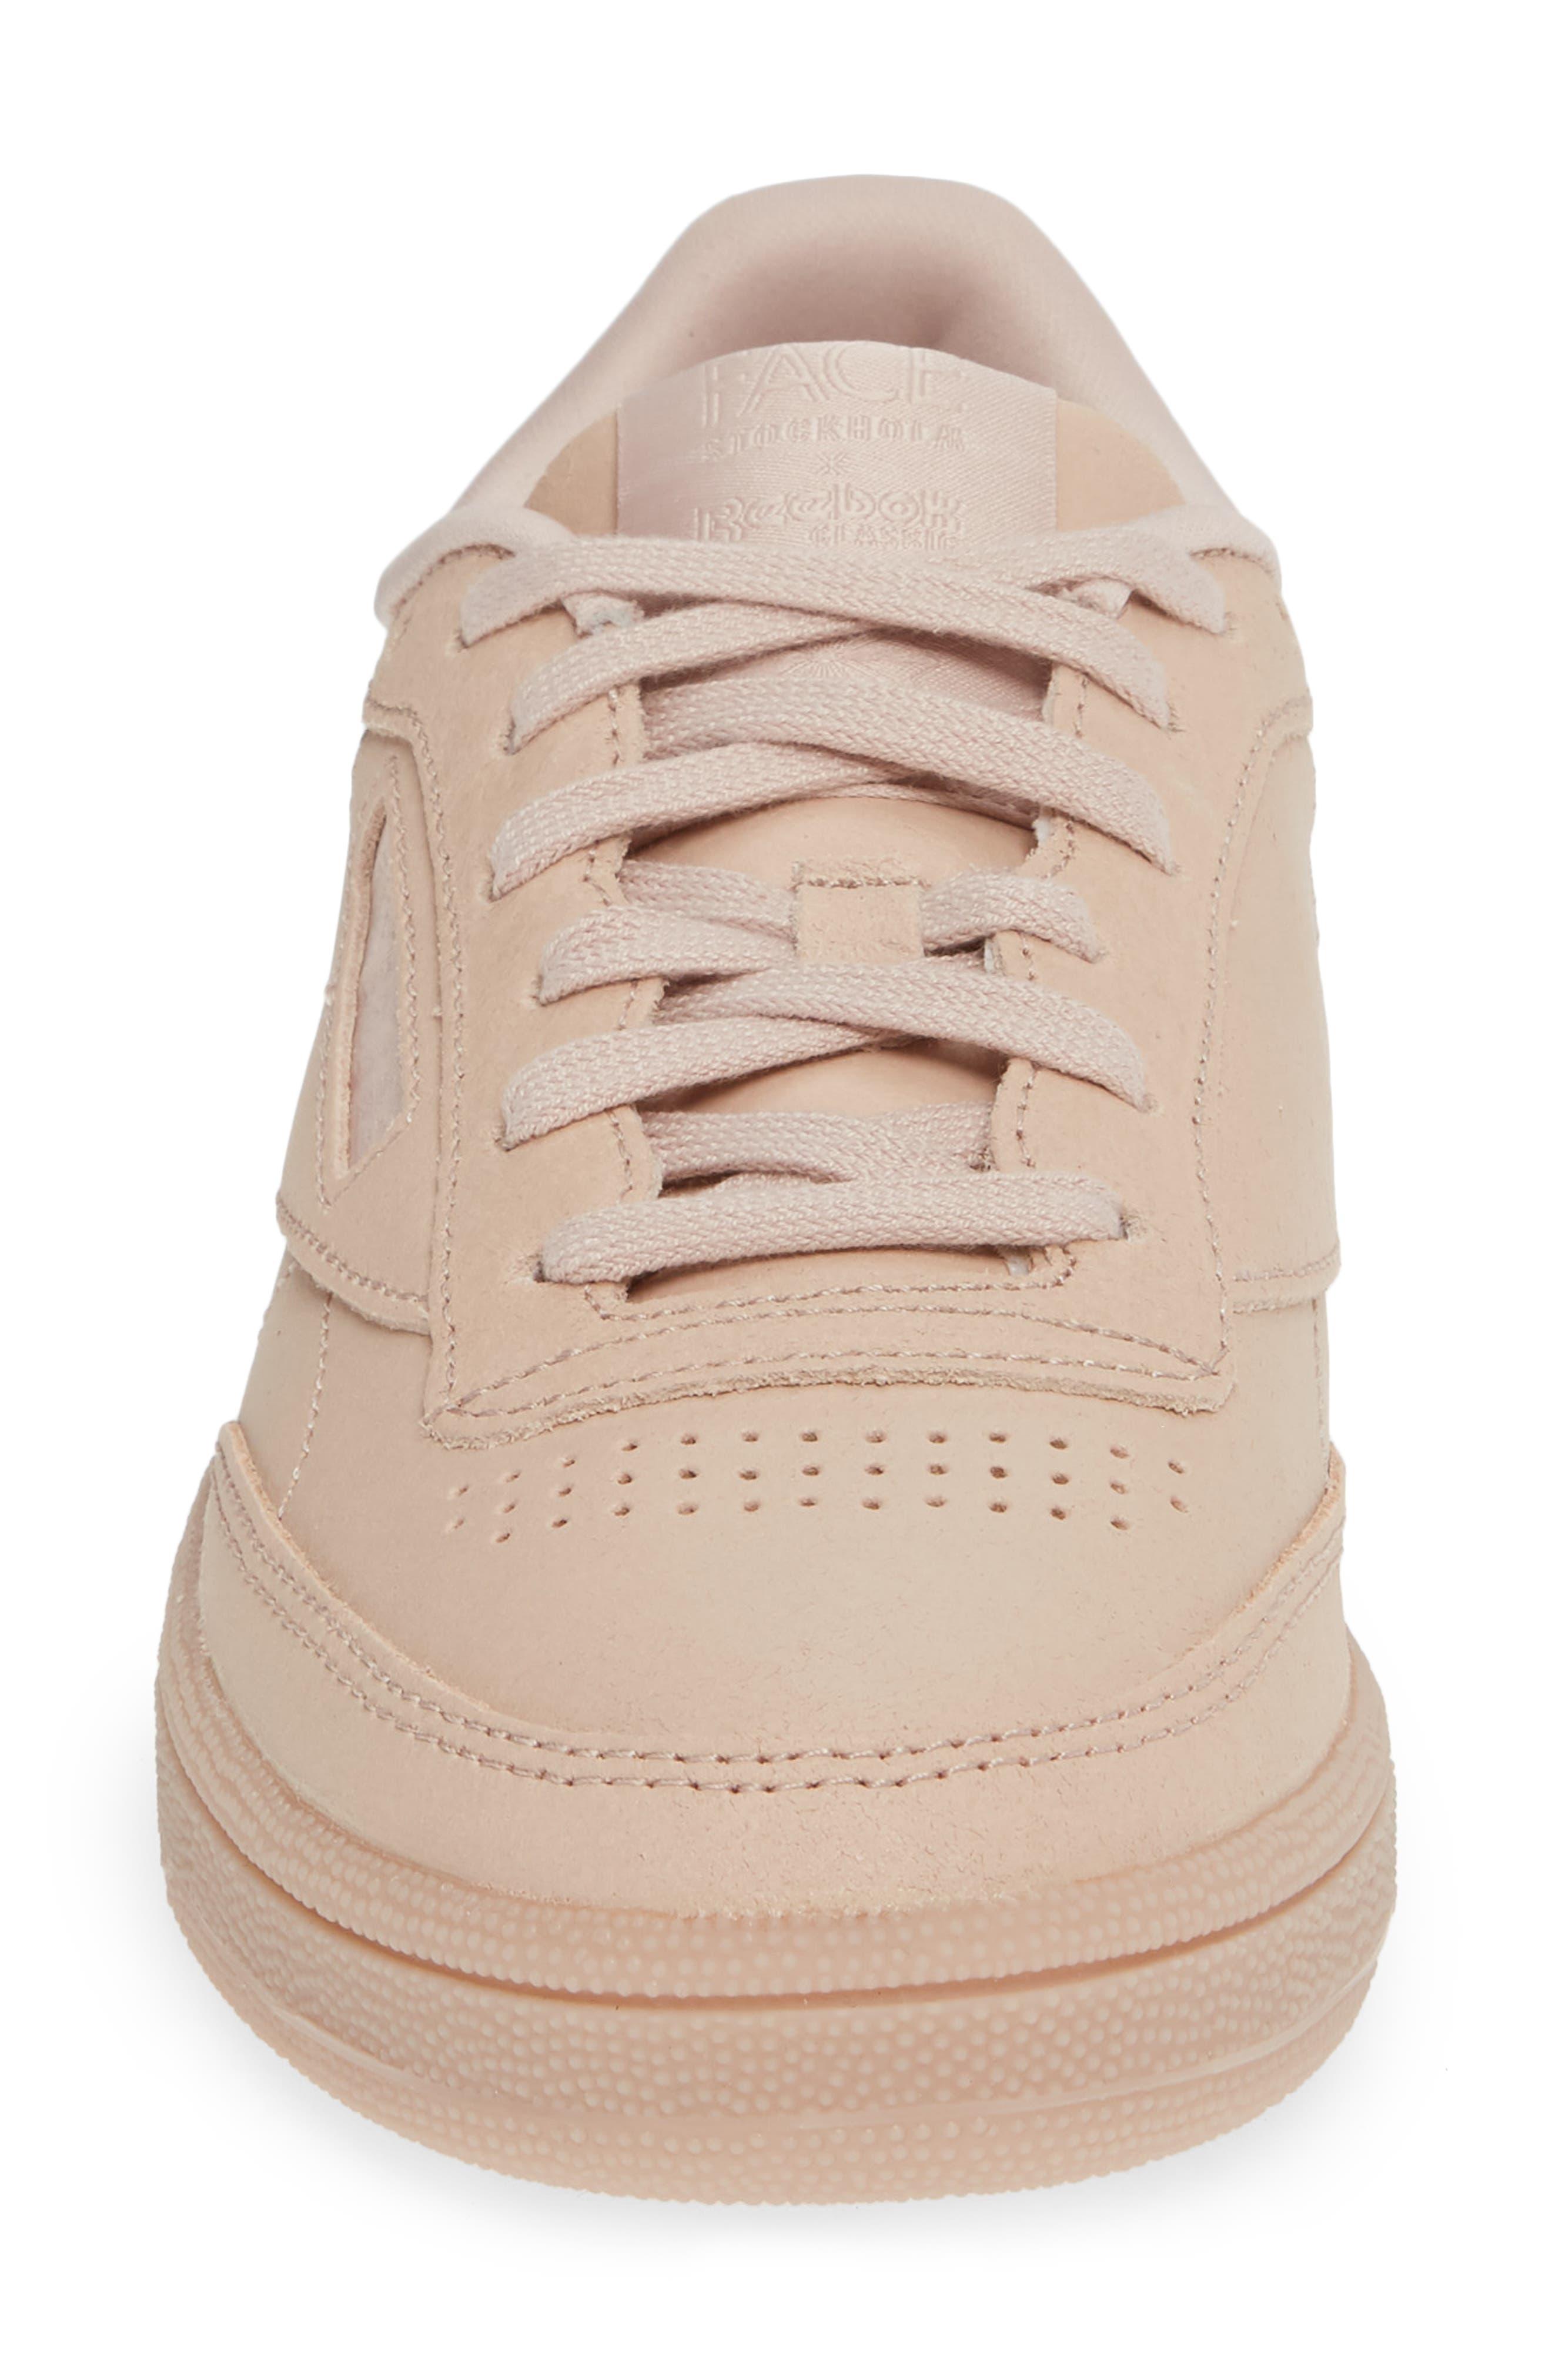 Club C 85 Sneaker,                             Alternate thumbnail 4, color,                             BARE BEIGE/ WHITE